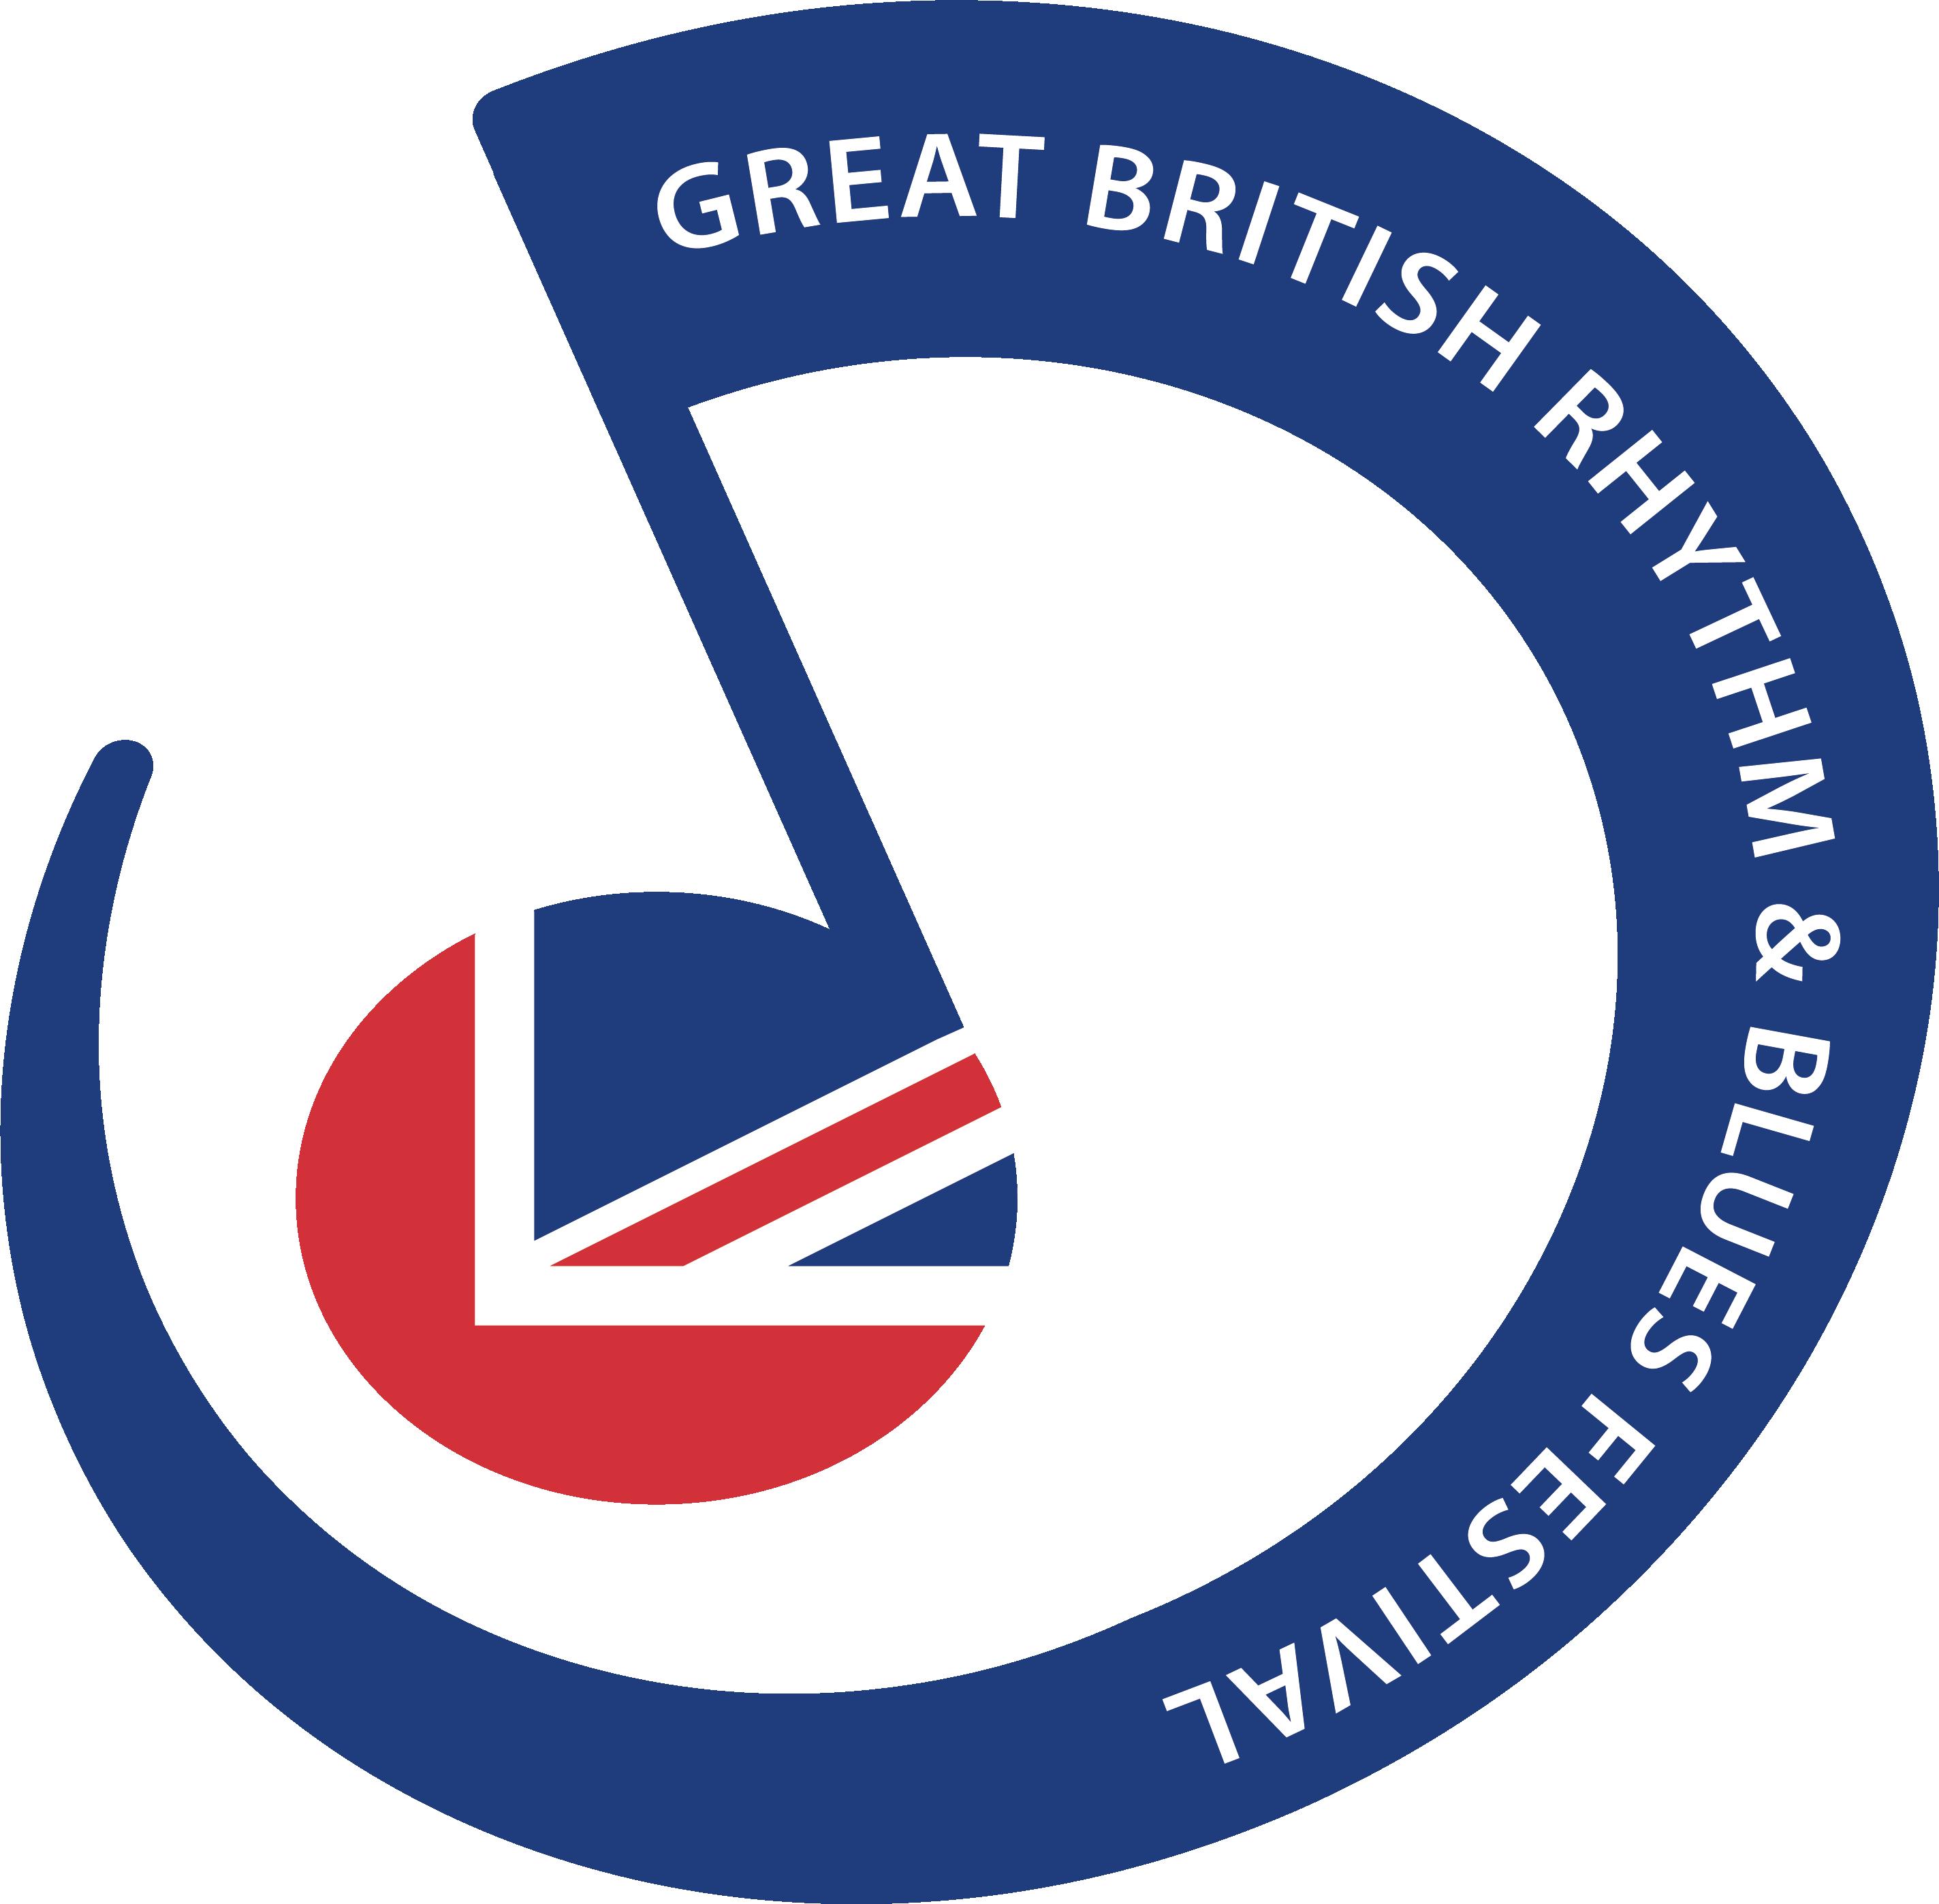 The Great British Rhythm & Blues Festival - Full Festival Ticket banner image